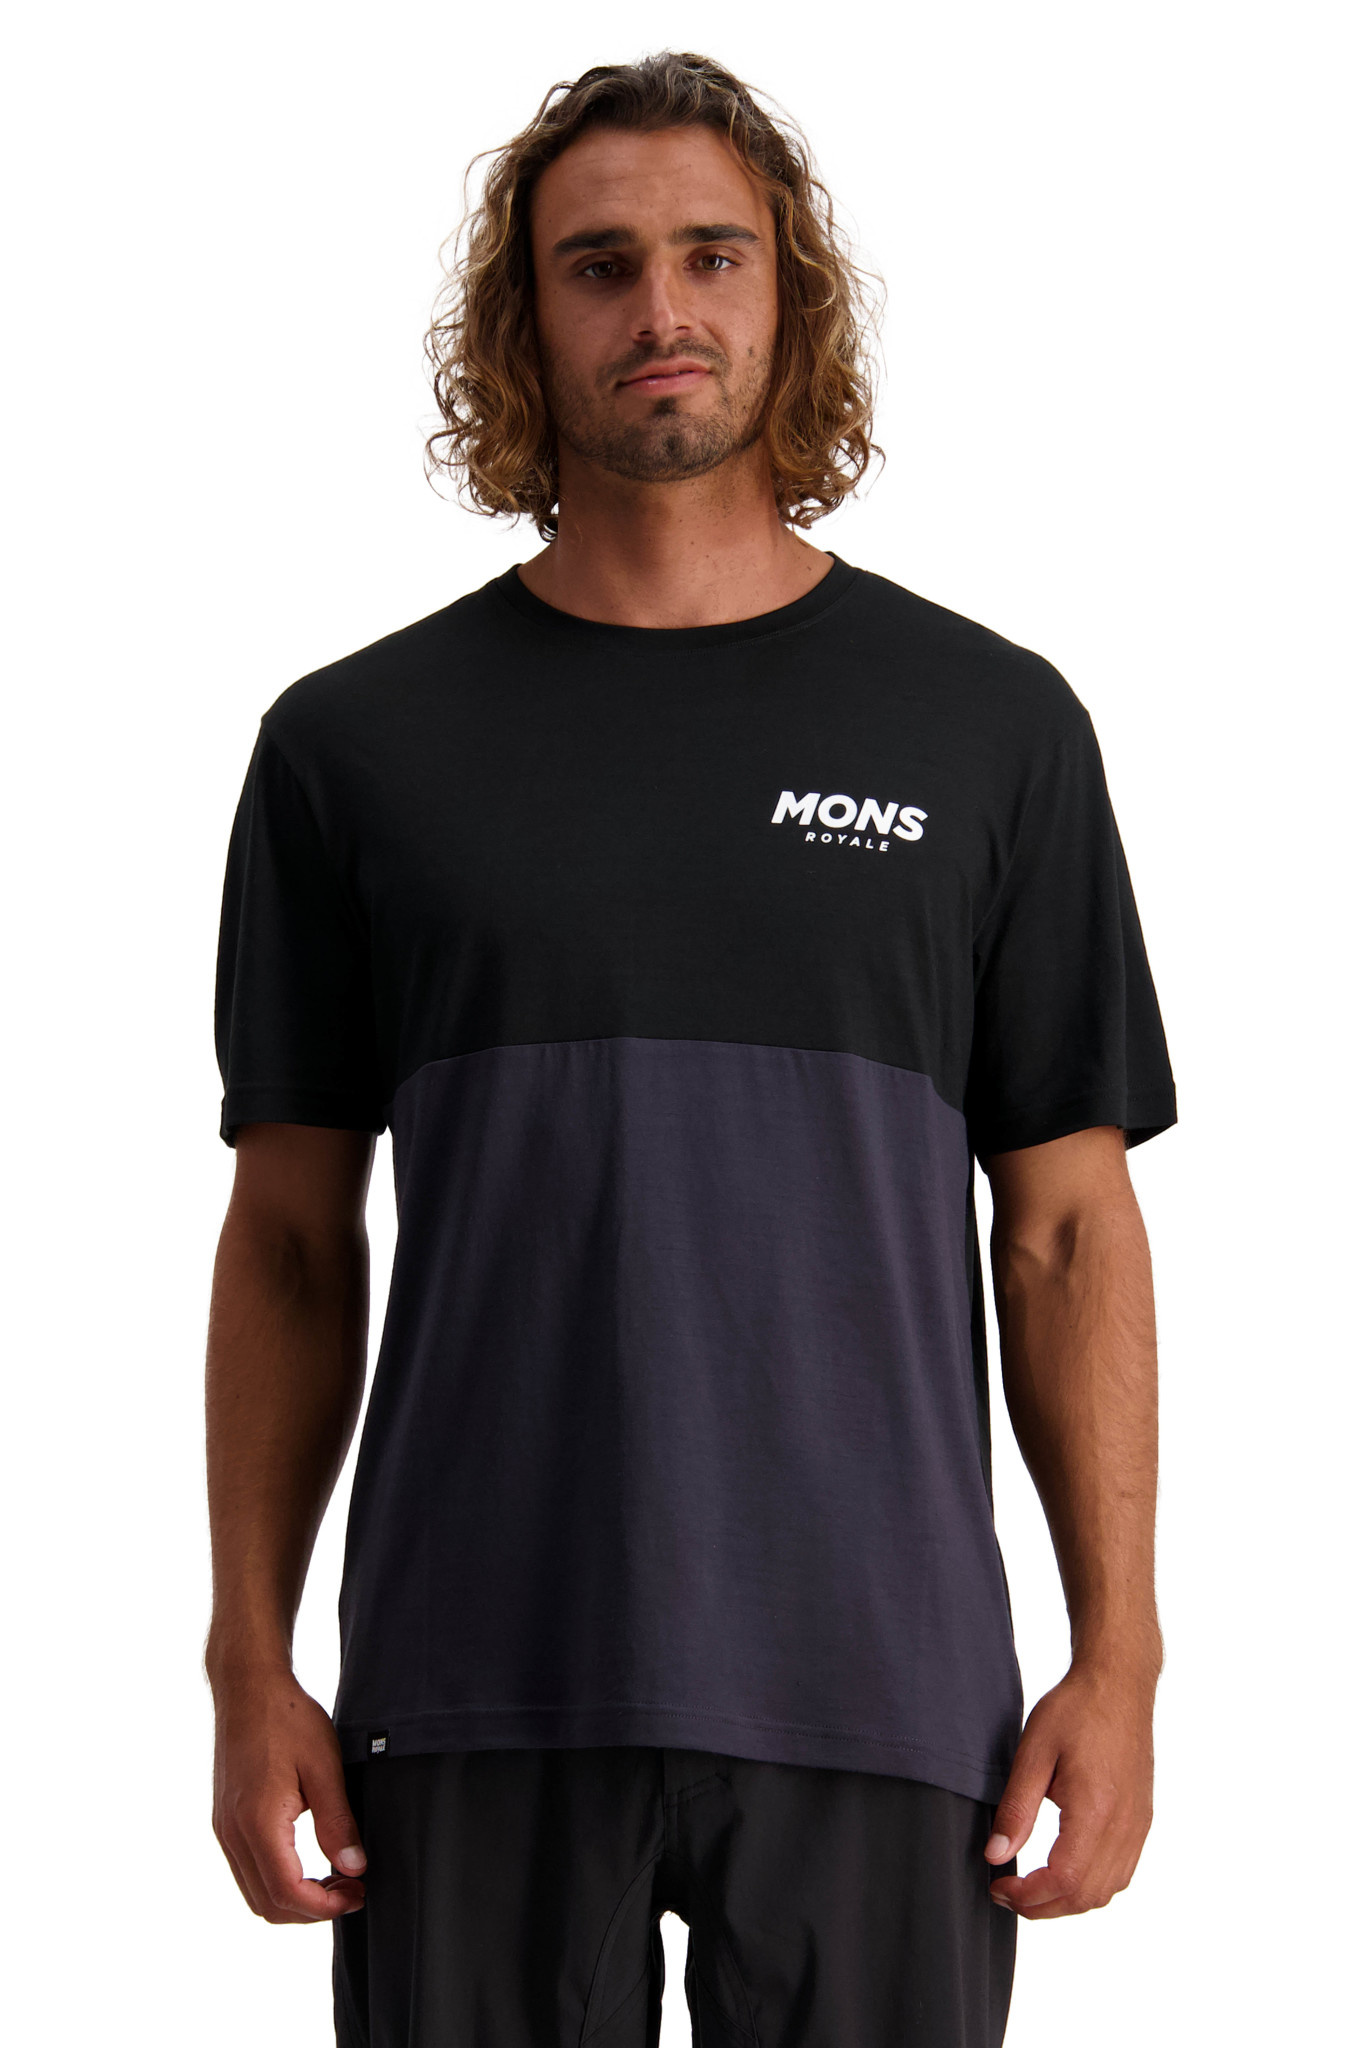 MONS ROYALE Mons Royale Men's Tarn Freeride Tee